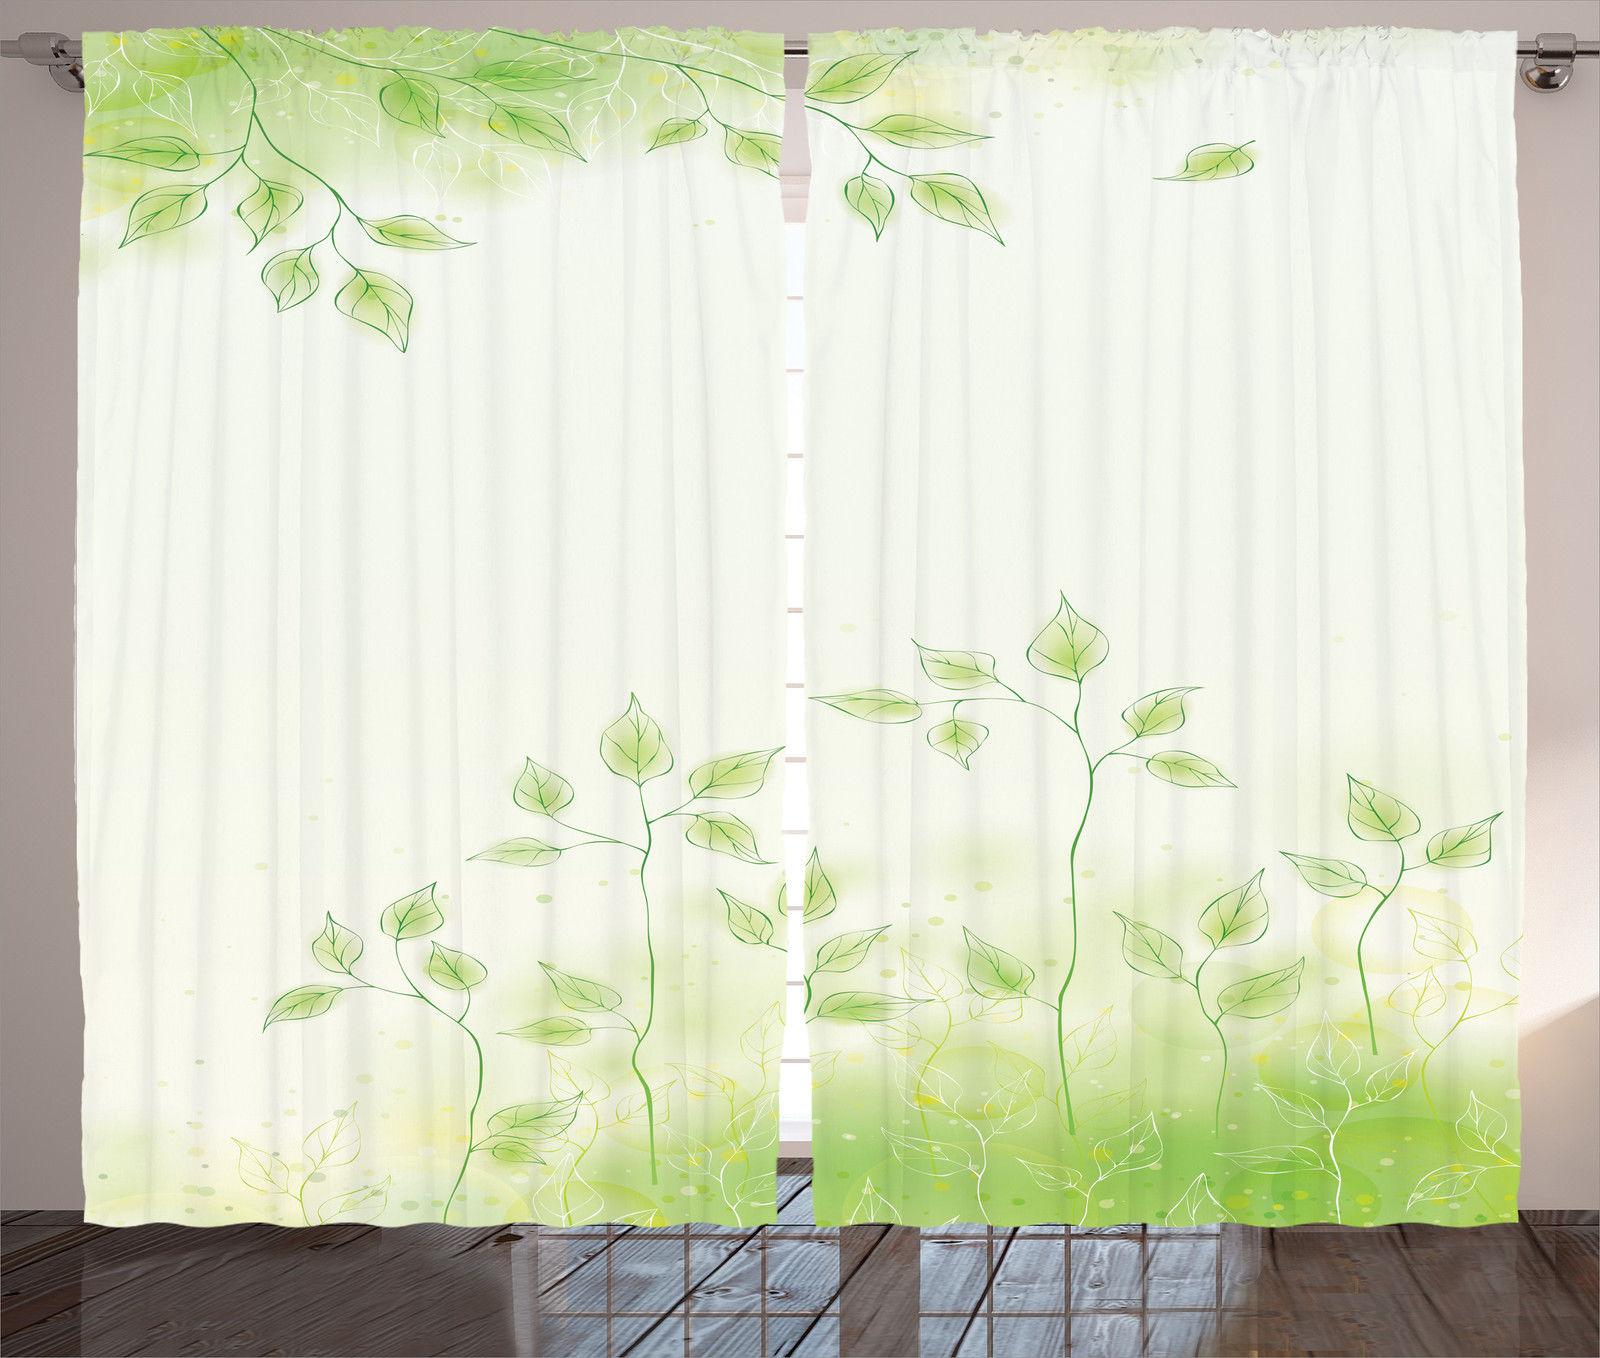 Foliage Design With Green Leaves Theme Botanical Zen Decor